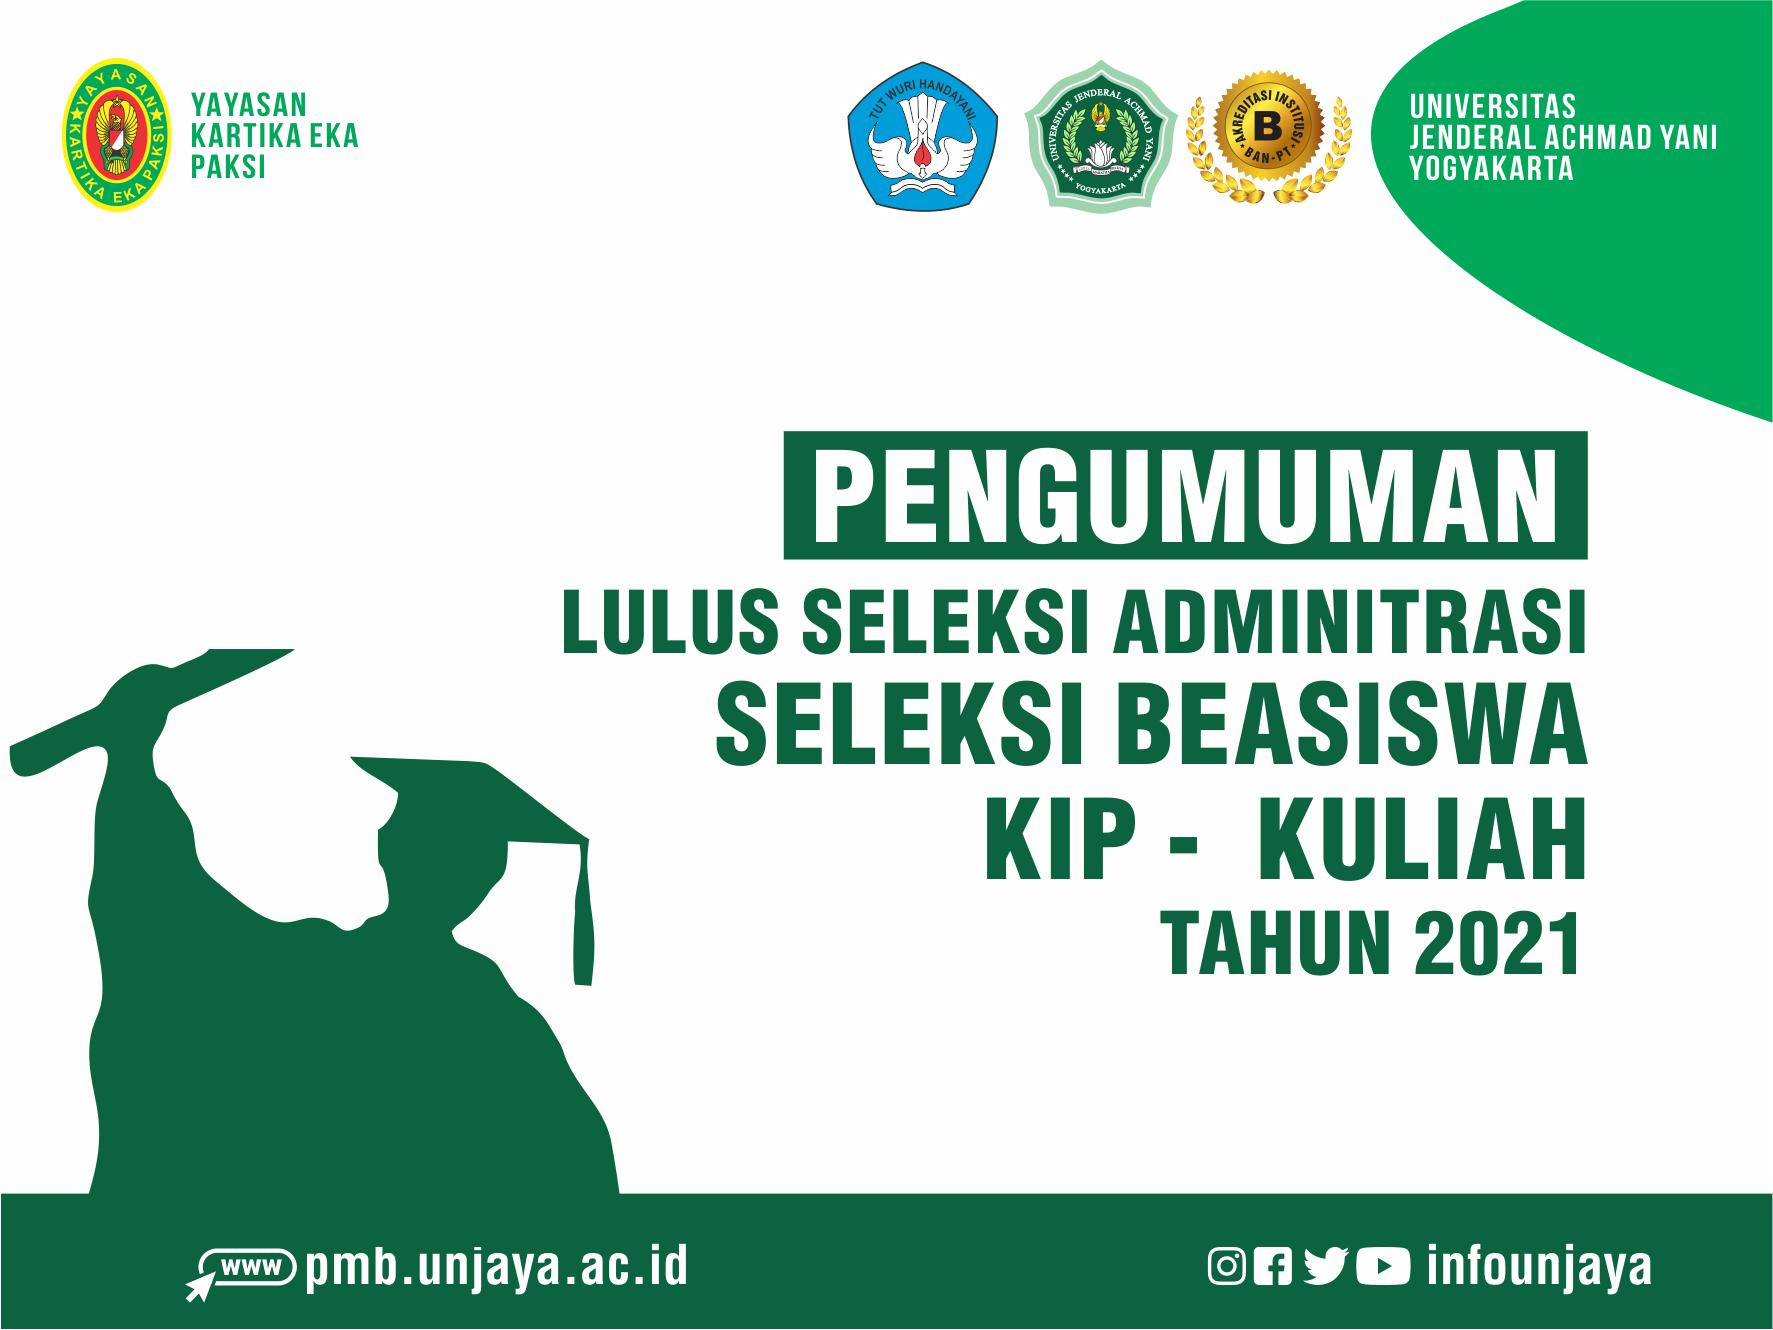 Pengumuman Lulus Seleksi Administrasi KIP Kuliah UNJAYA Tahun 2021